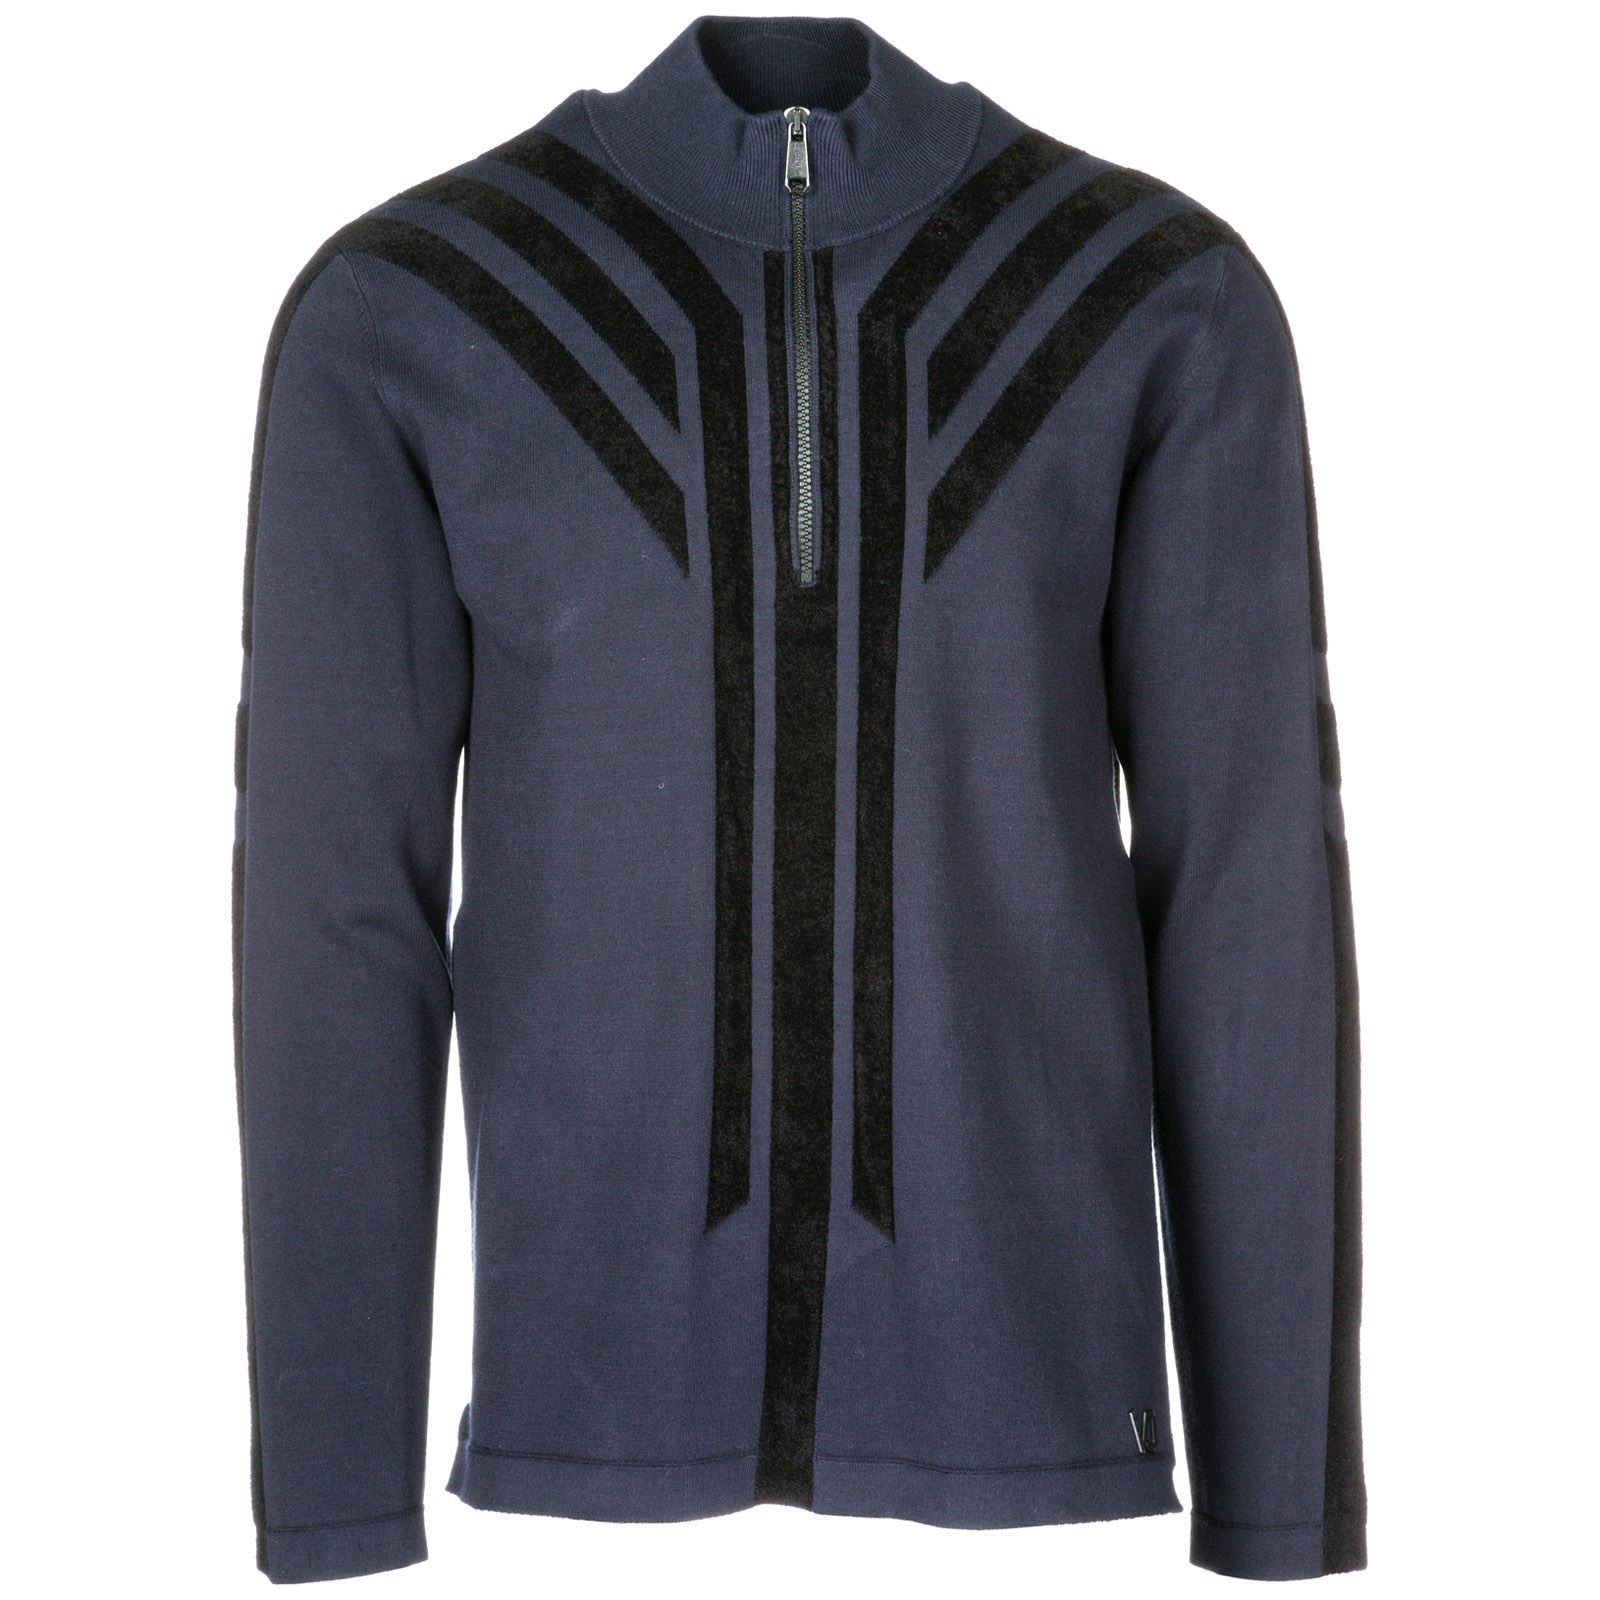 0caef266d4 Men's jumper sweater pullover with zip